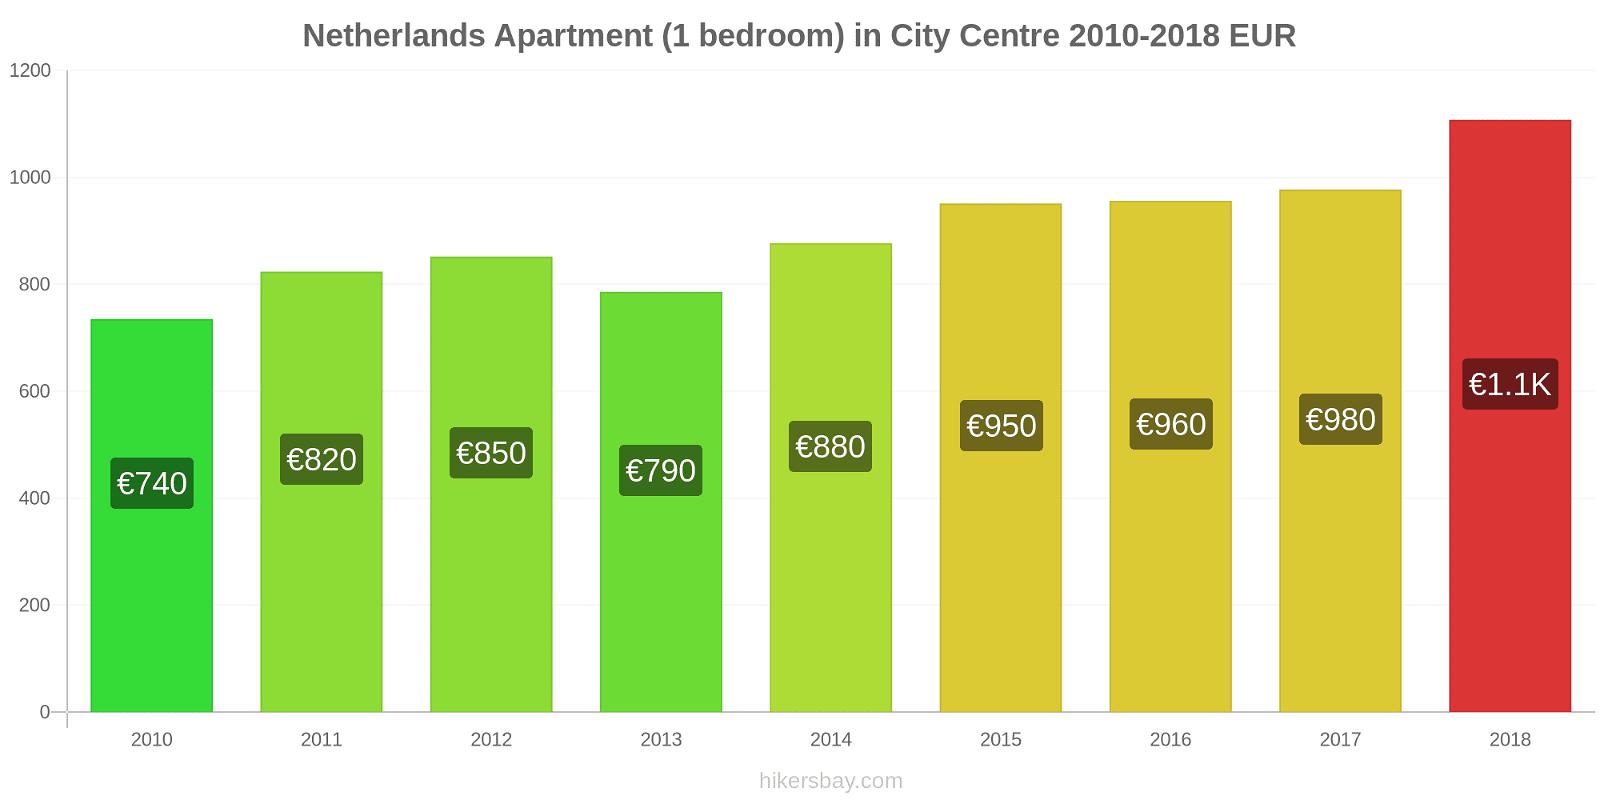 Netherlands price changes Apartment (1 bedroom) in City Centre hikersbay.com